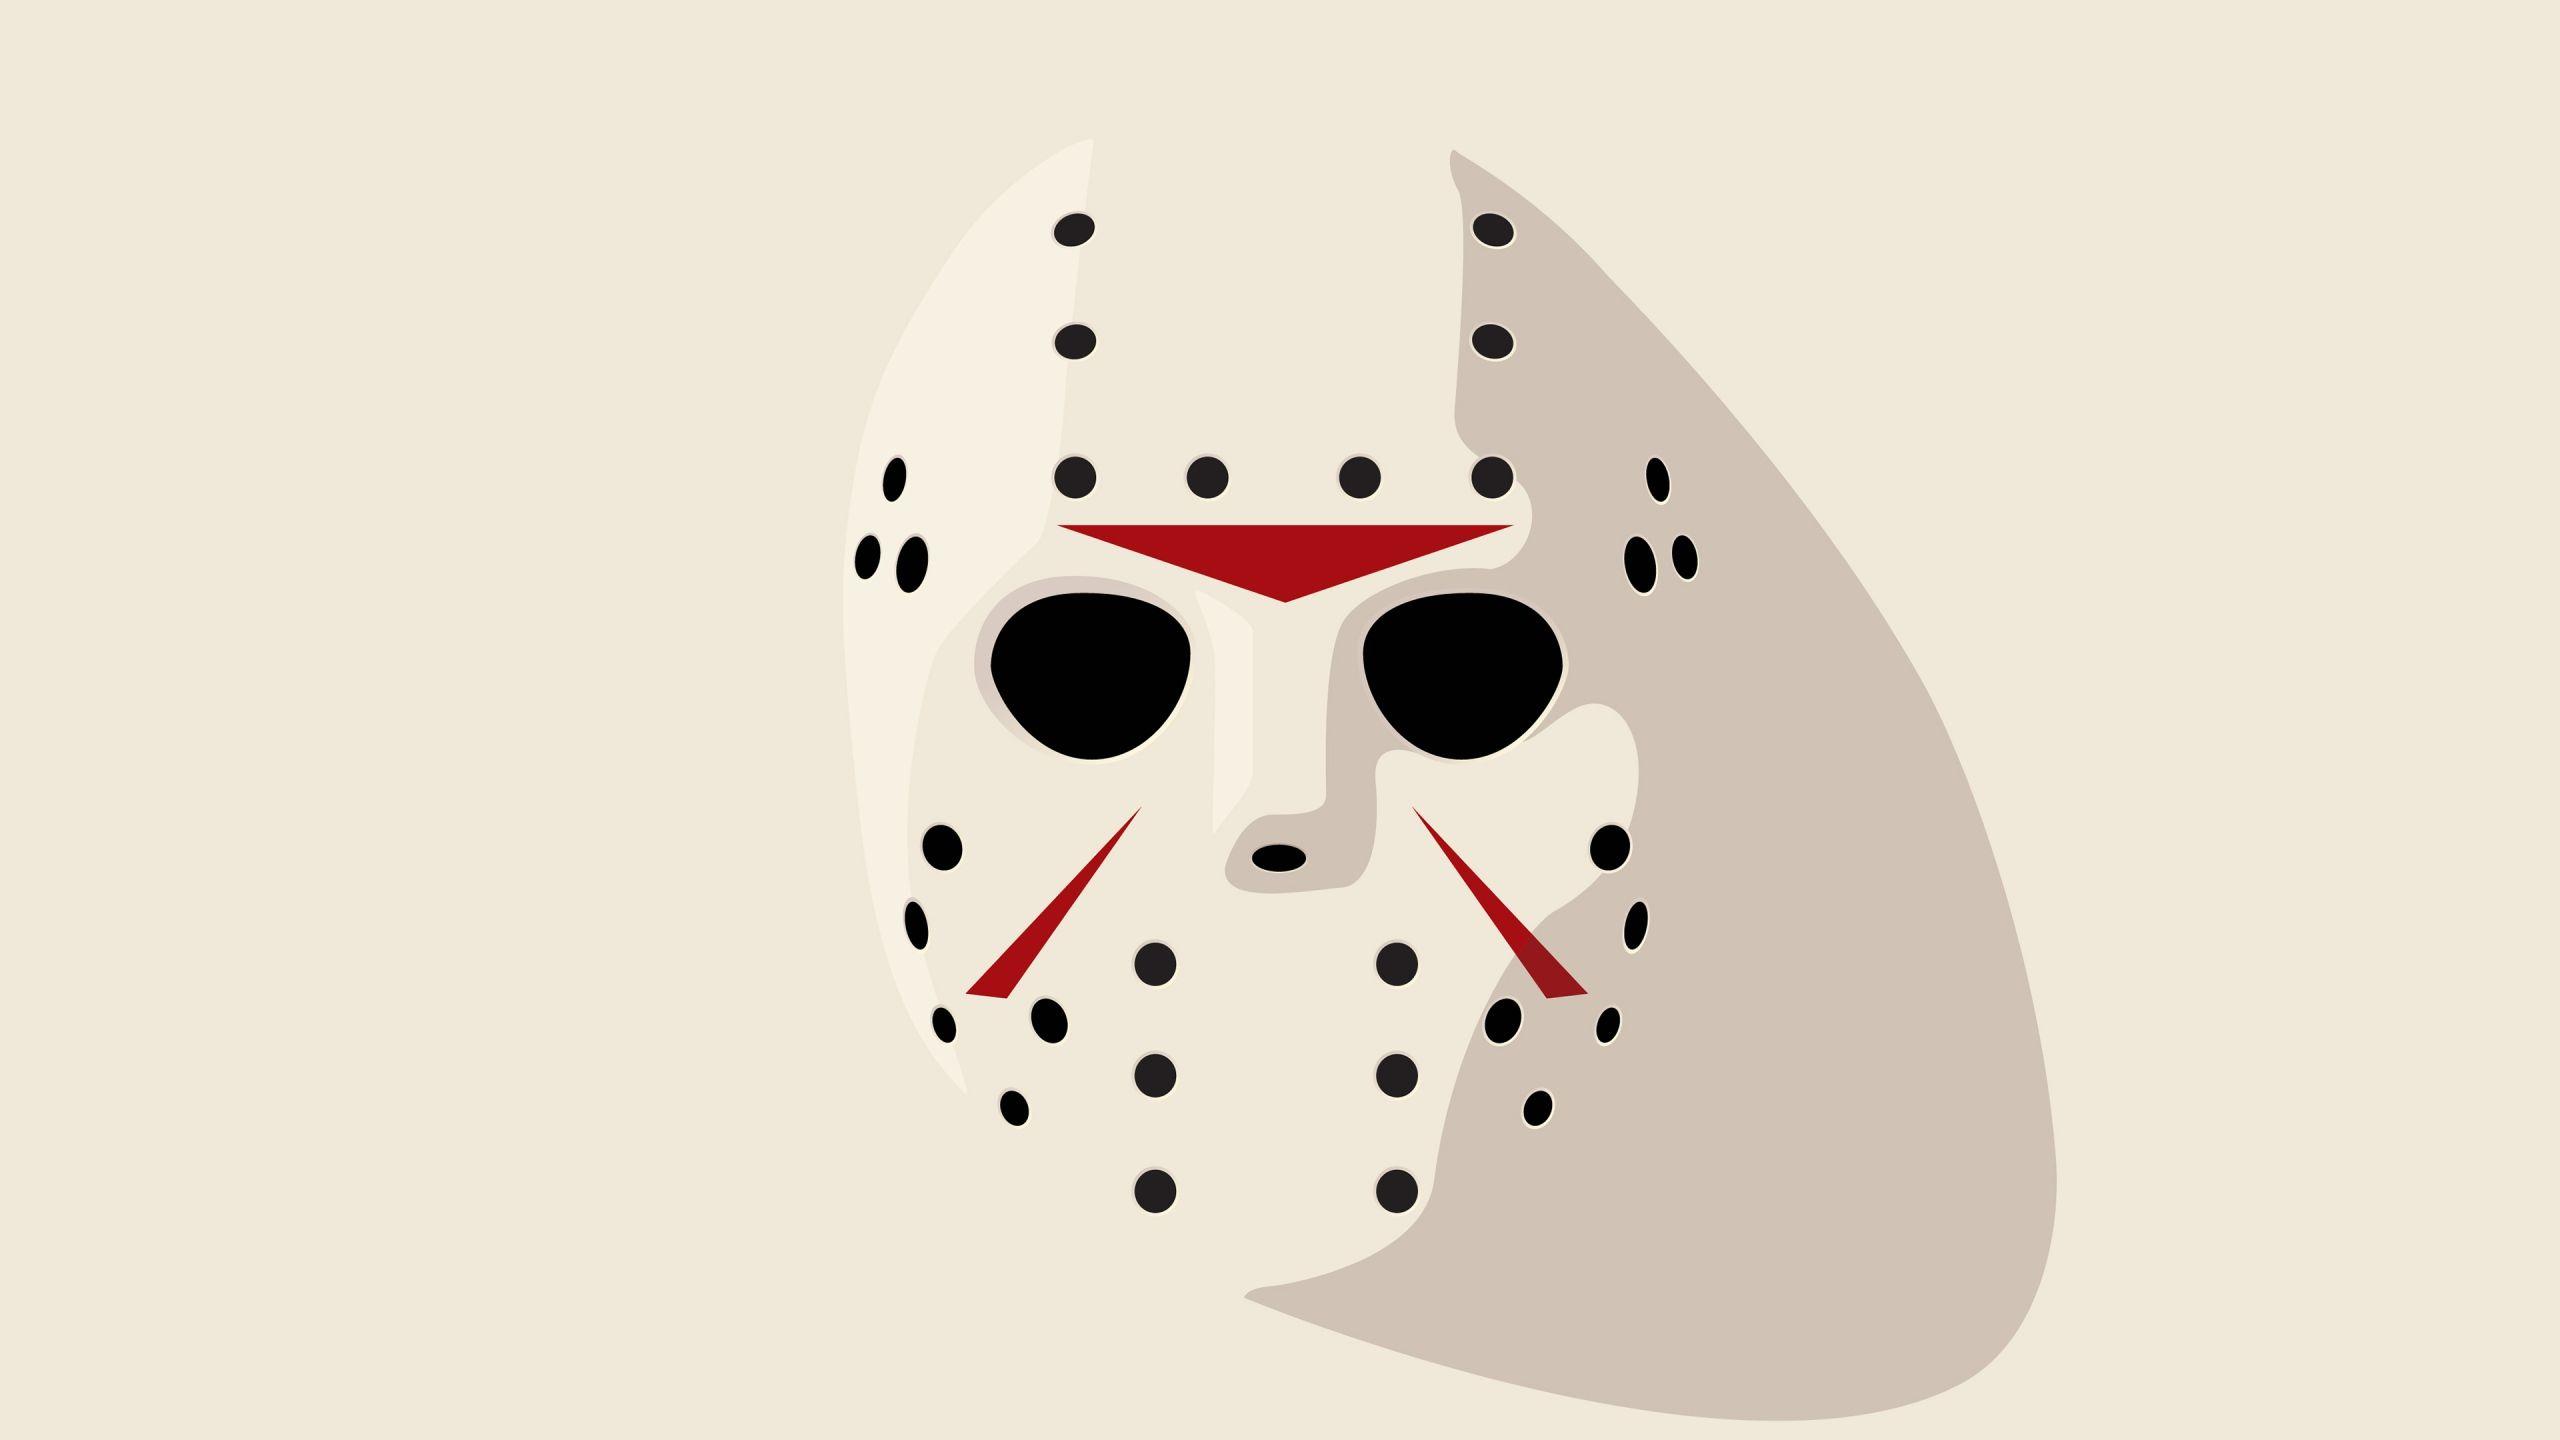 2560x1440 Wallpaper Jason Friday 13th Hockey Mask Art Wallpaper Mask Drawing Horror